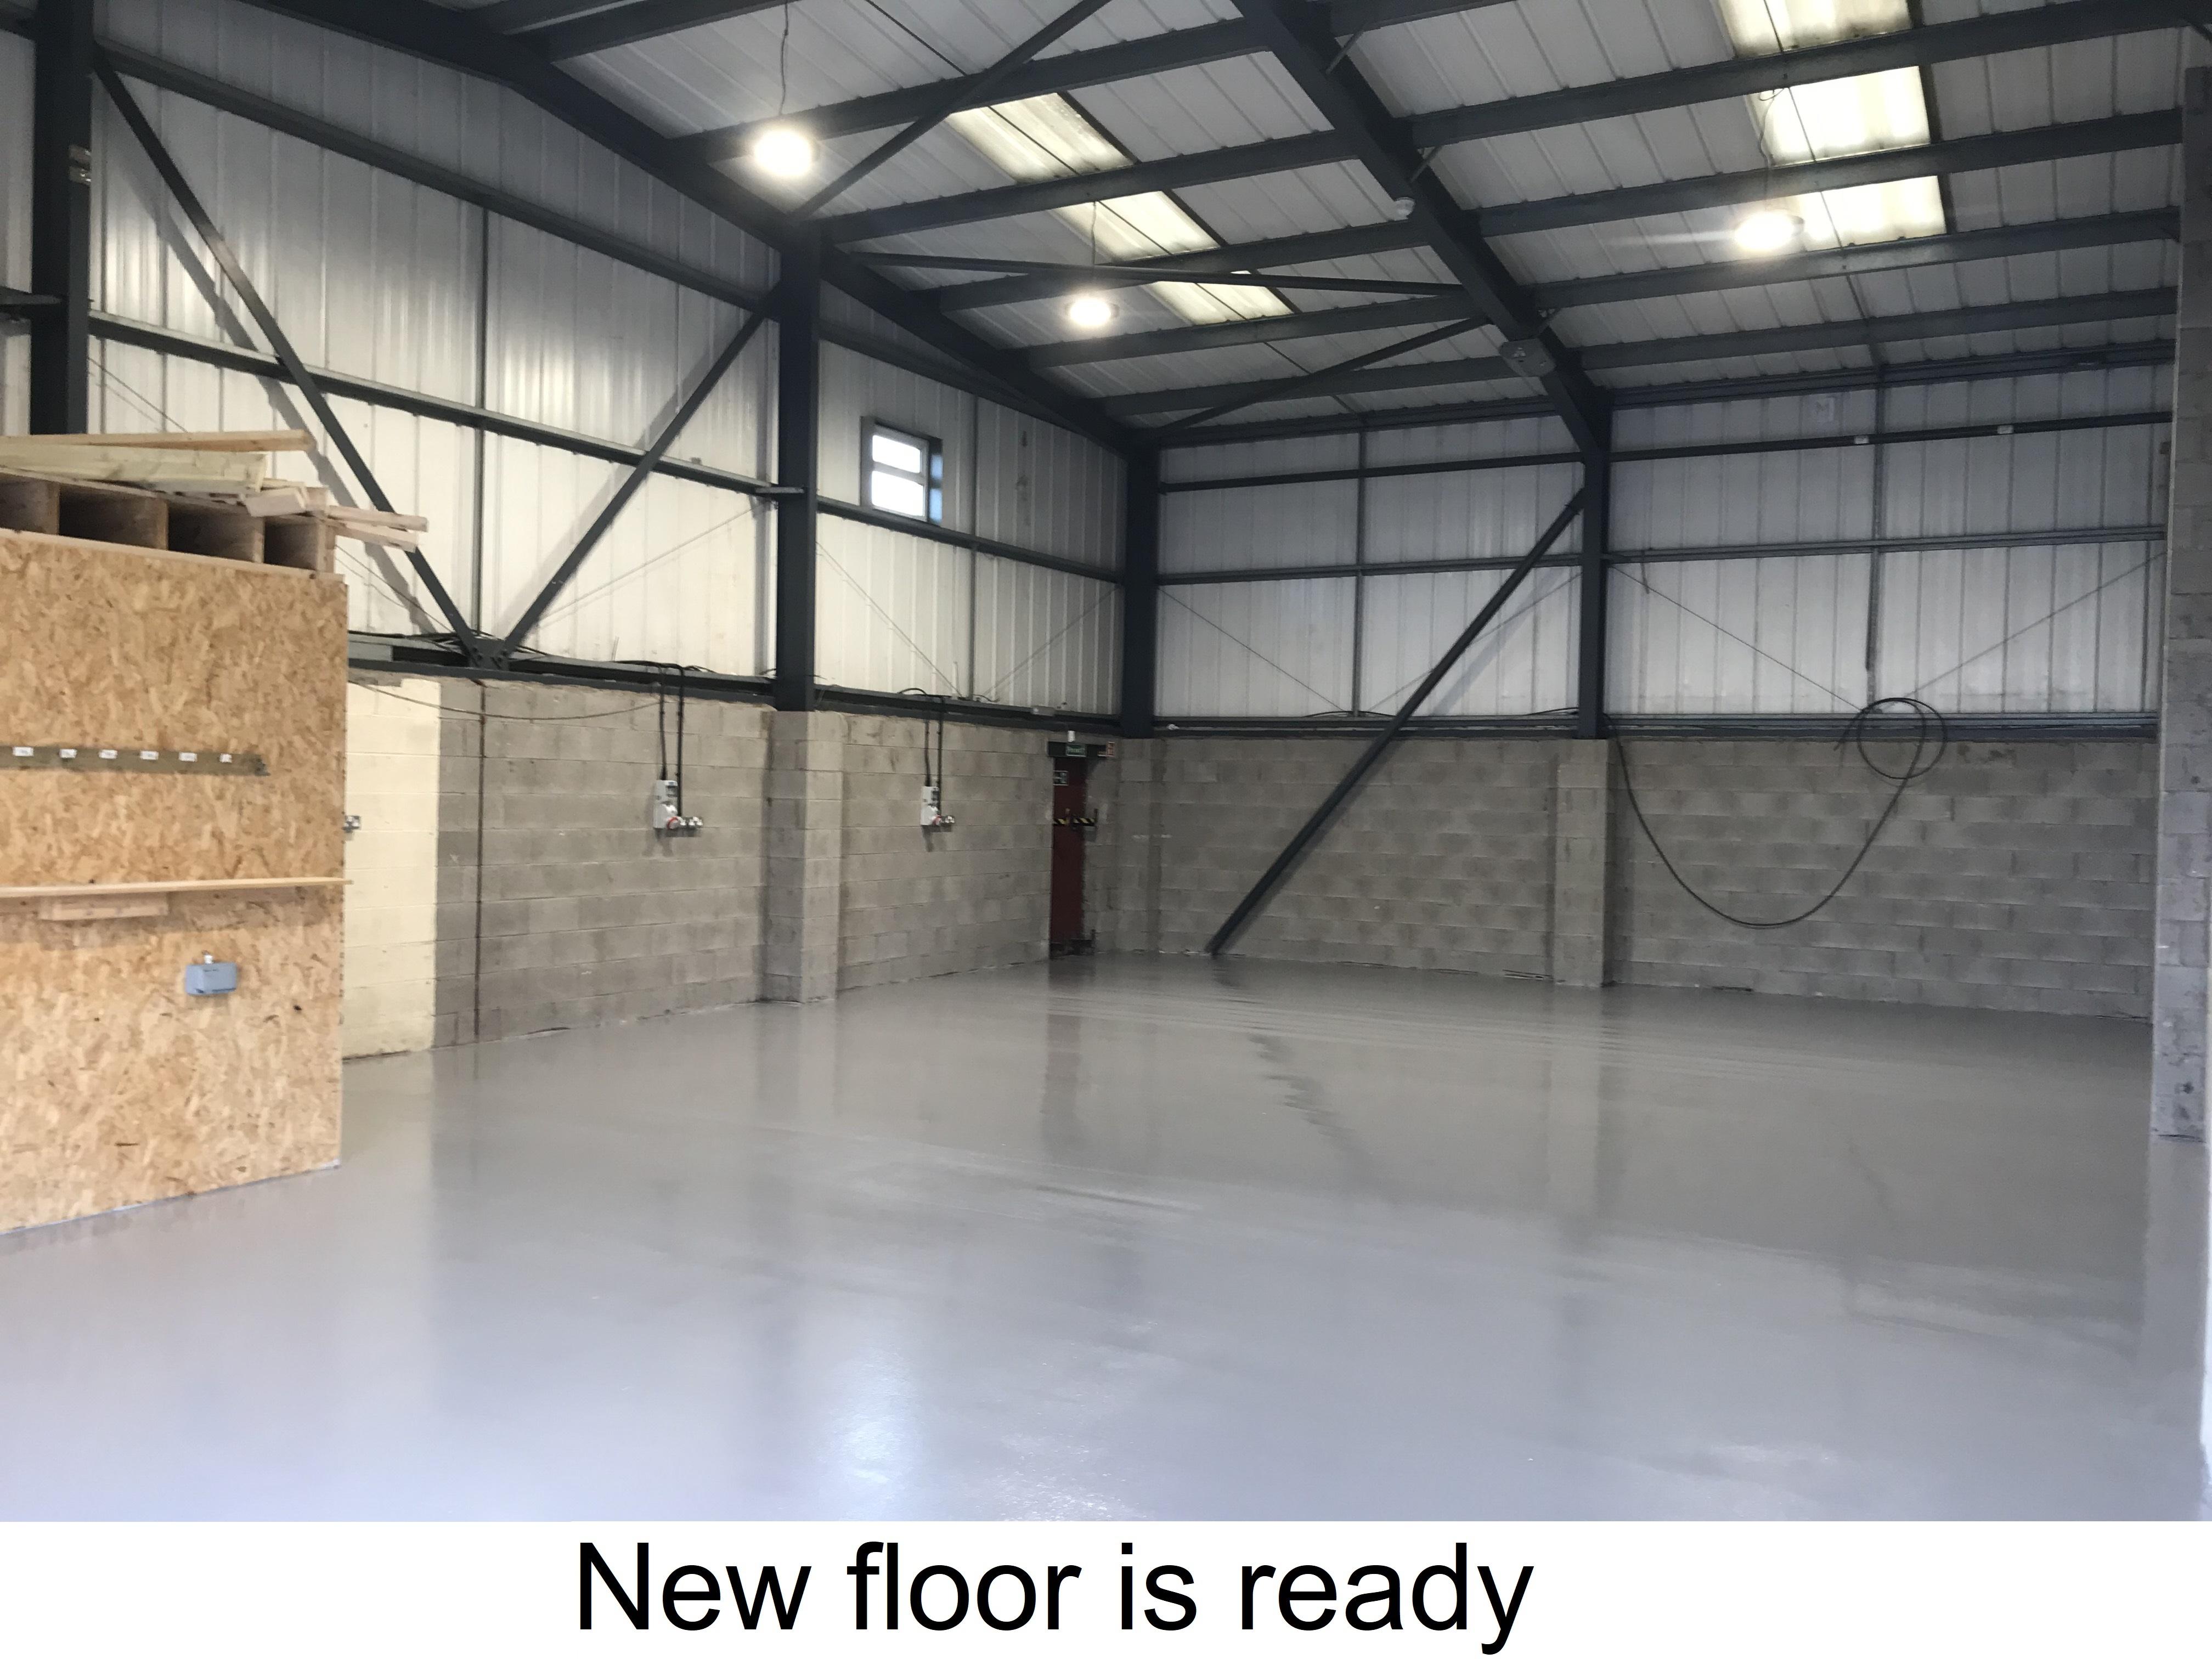 https://0201.nccdn.net/1_2/000/000/0f9/fce/8.-new-floor-is-ready.jpg